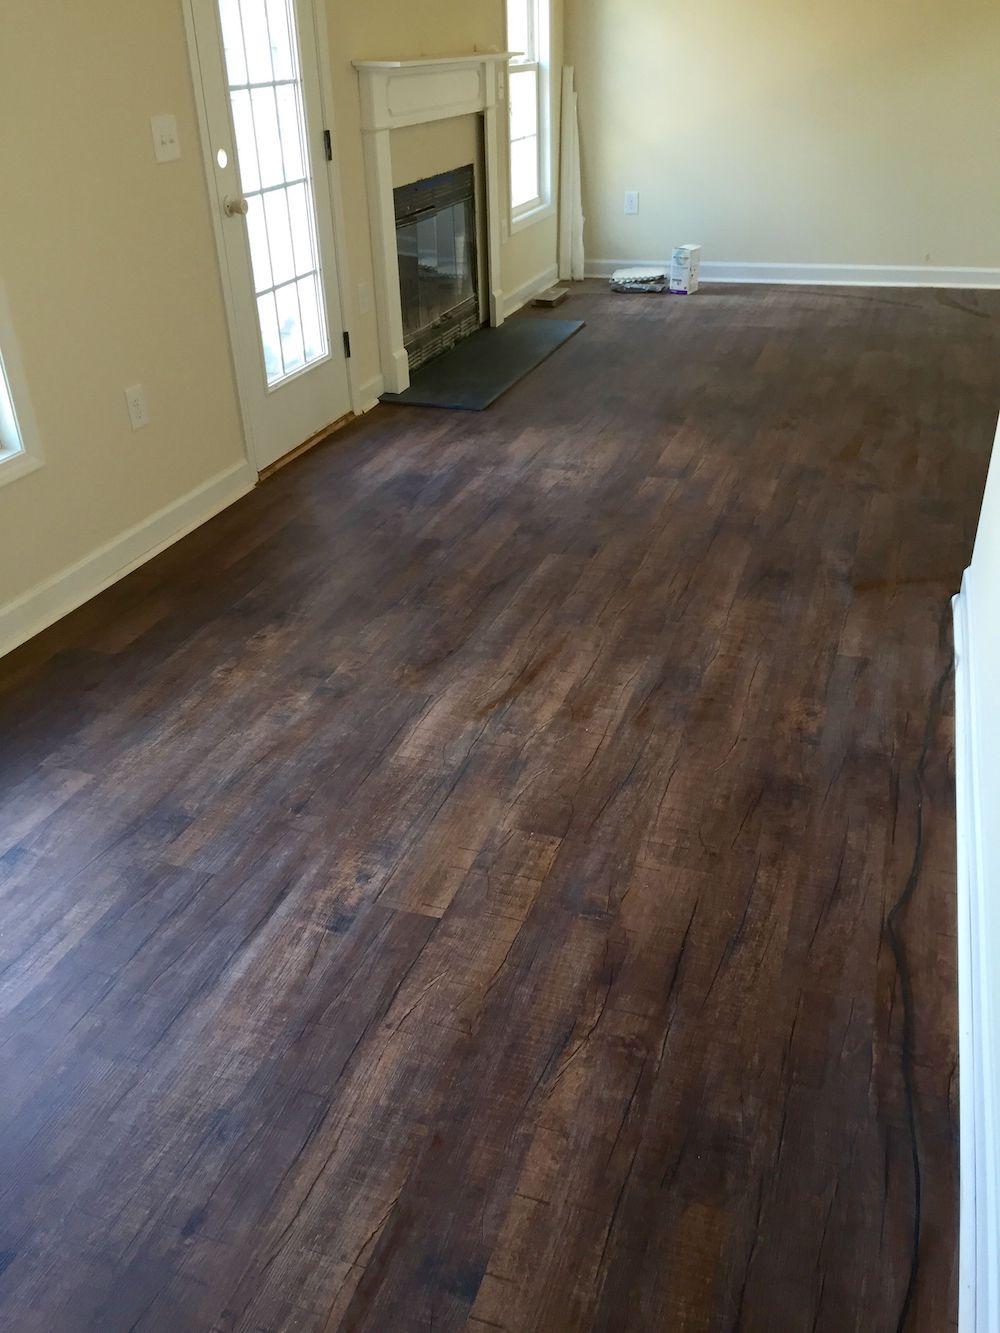 Medium-Dark Oak Wood Vinyl Plank